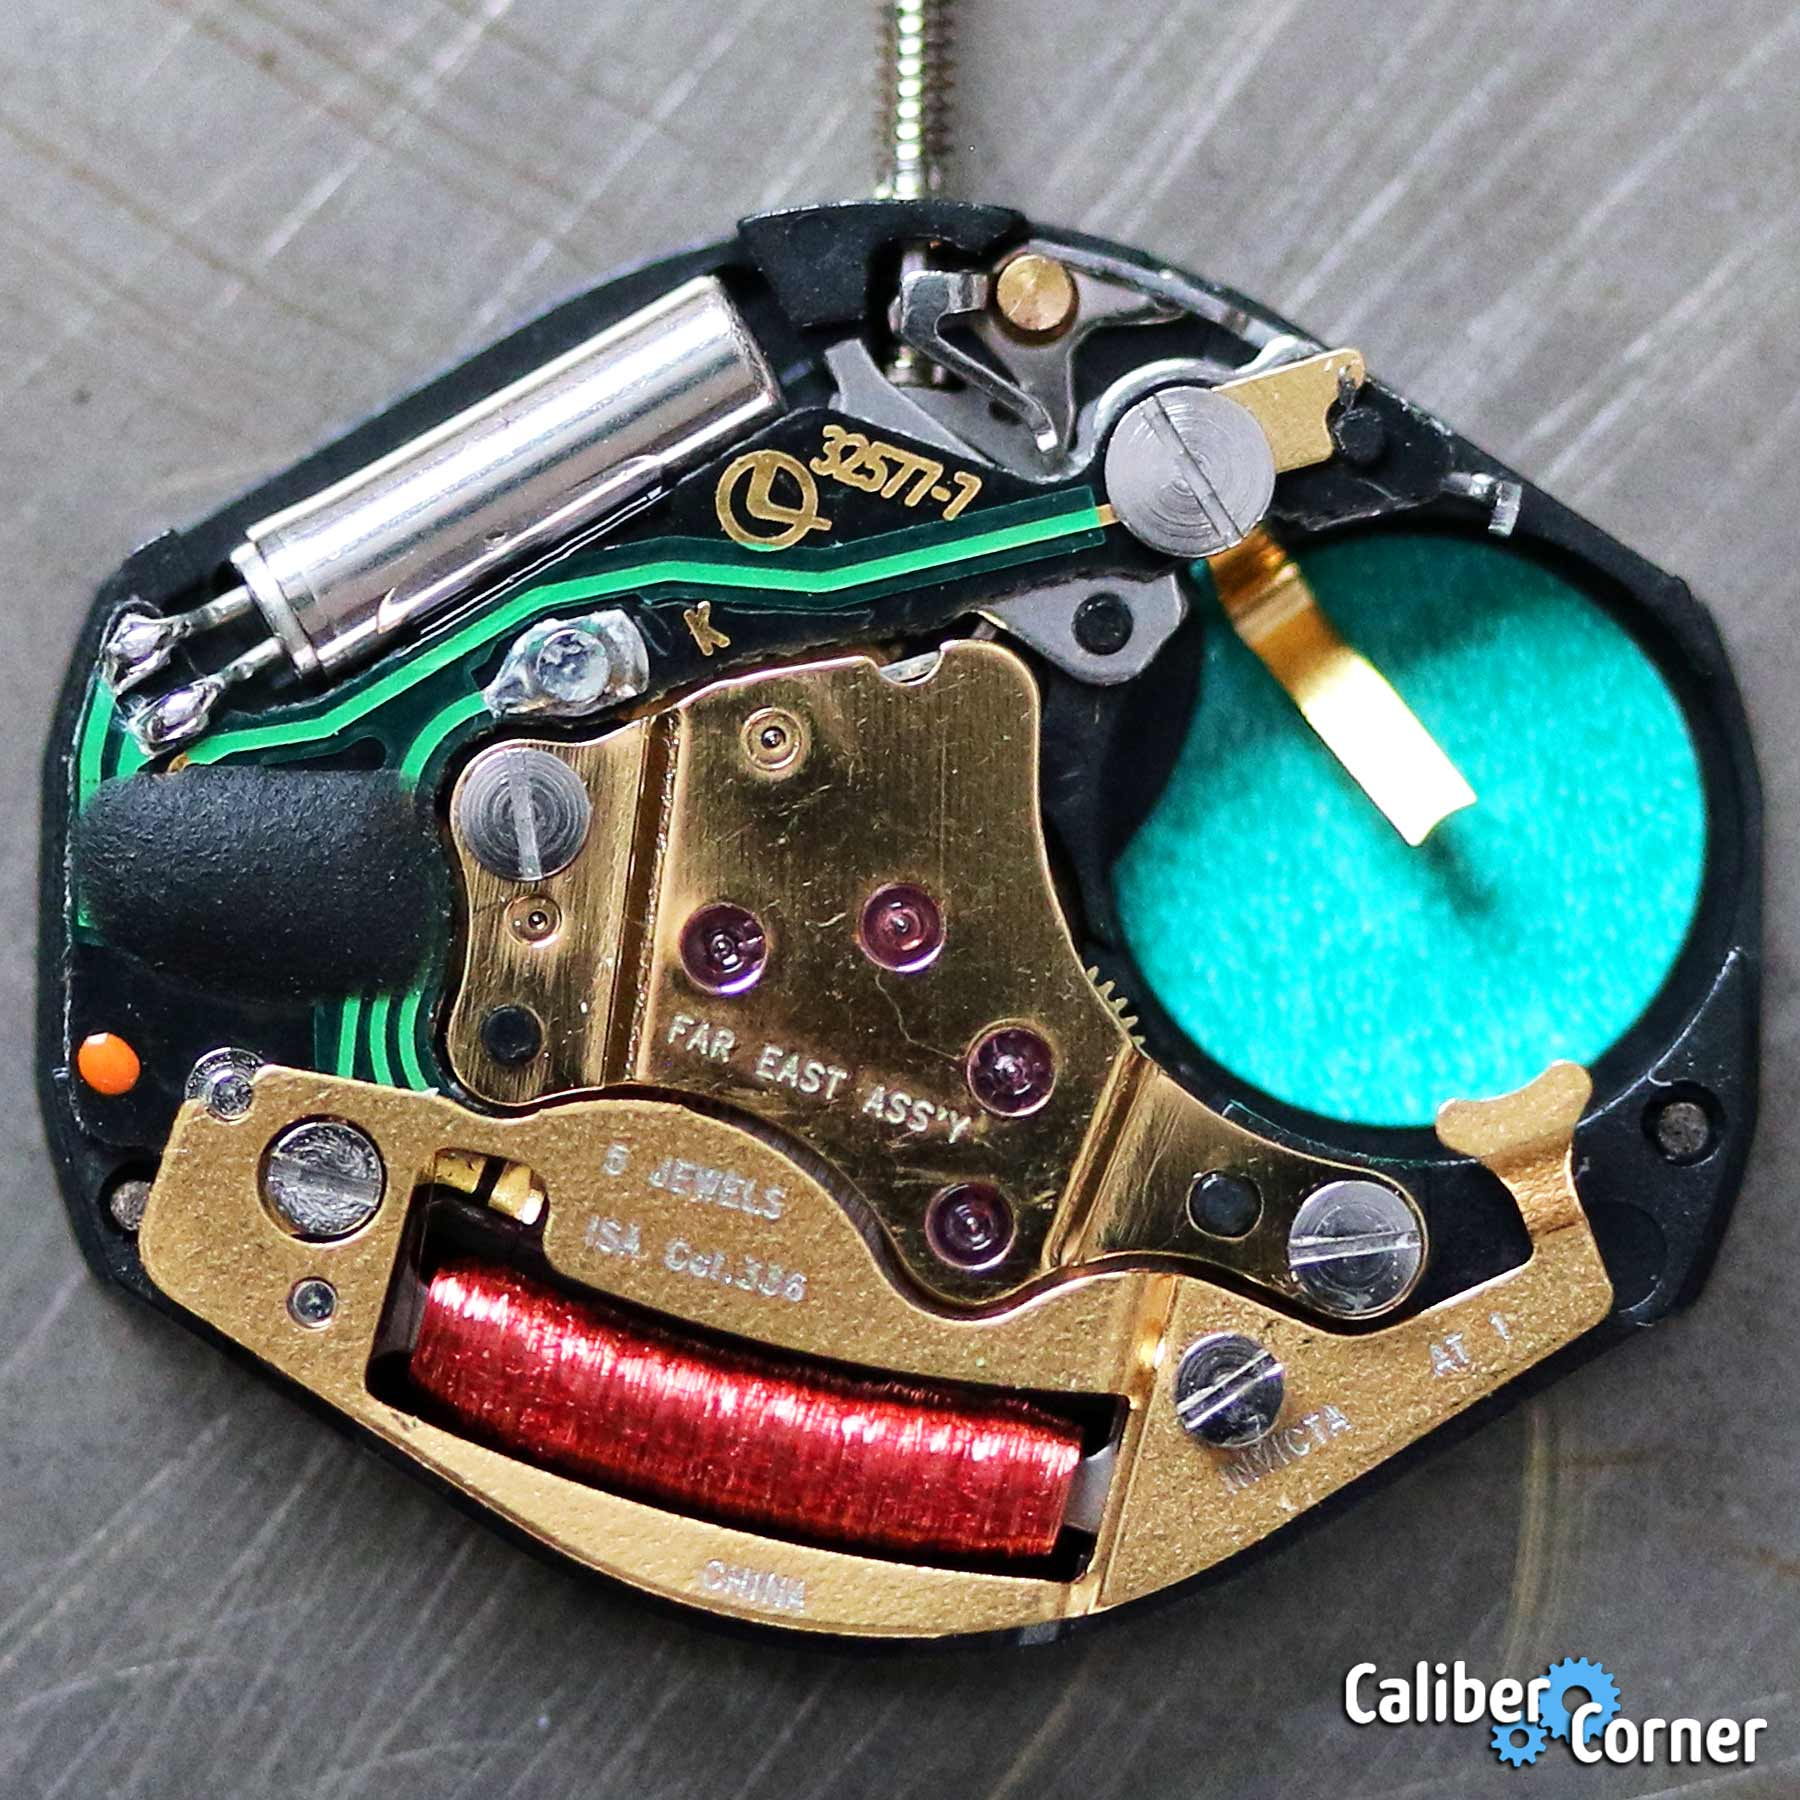 Isa Caliber 336 Battery